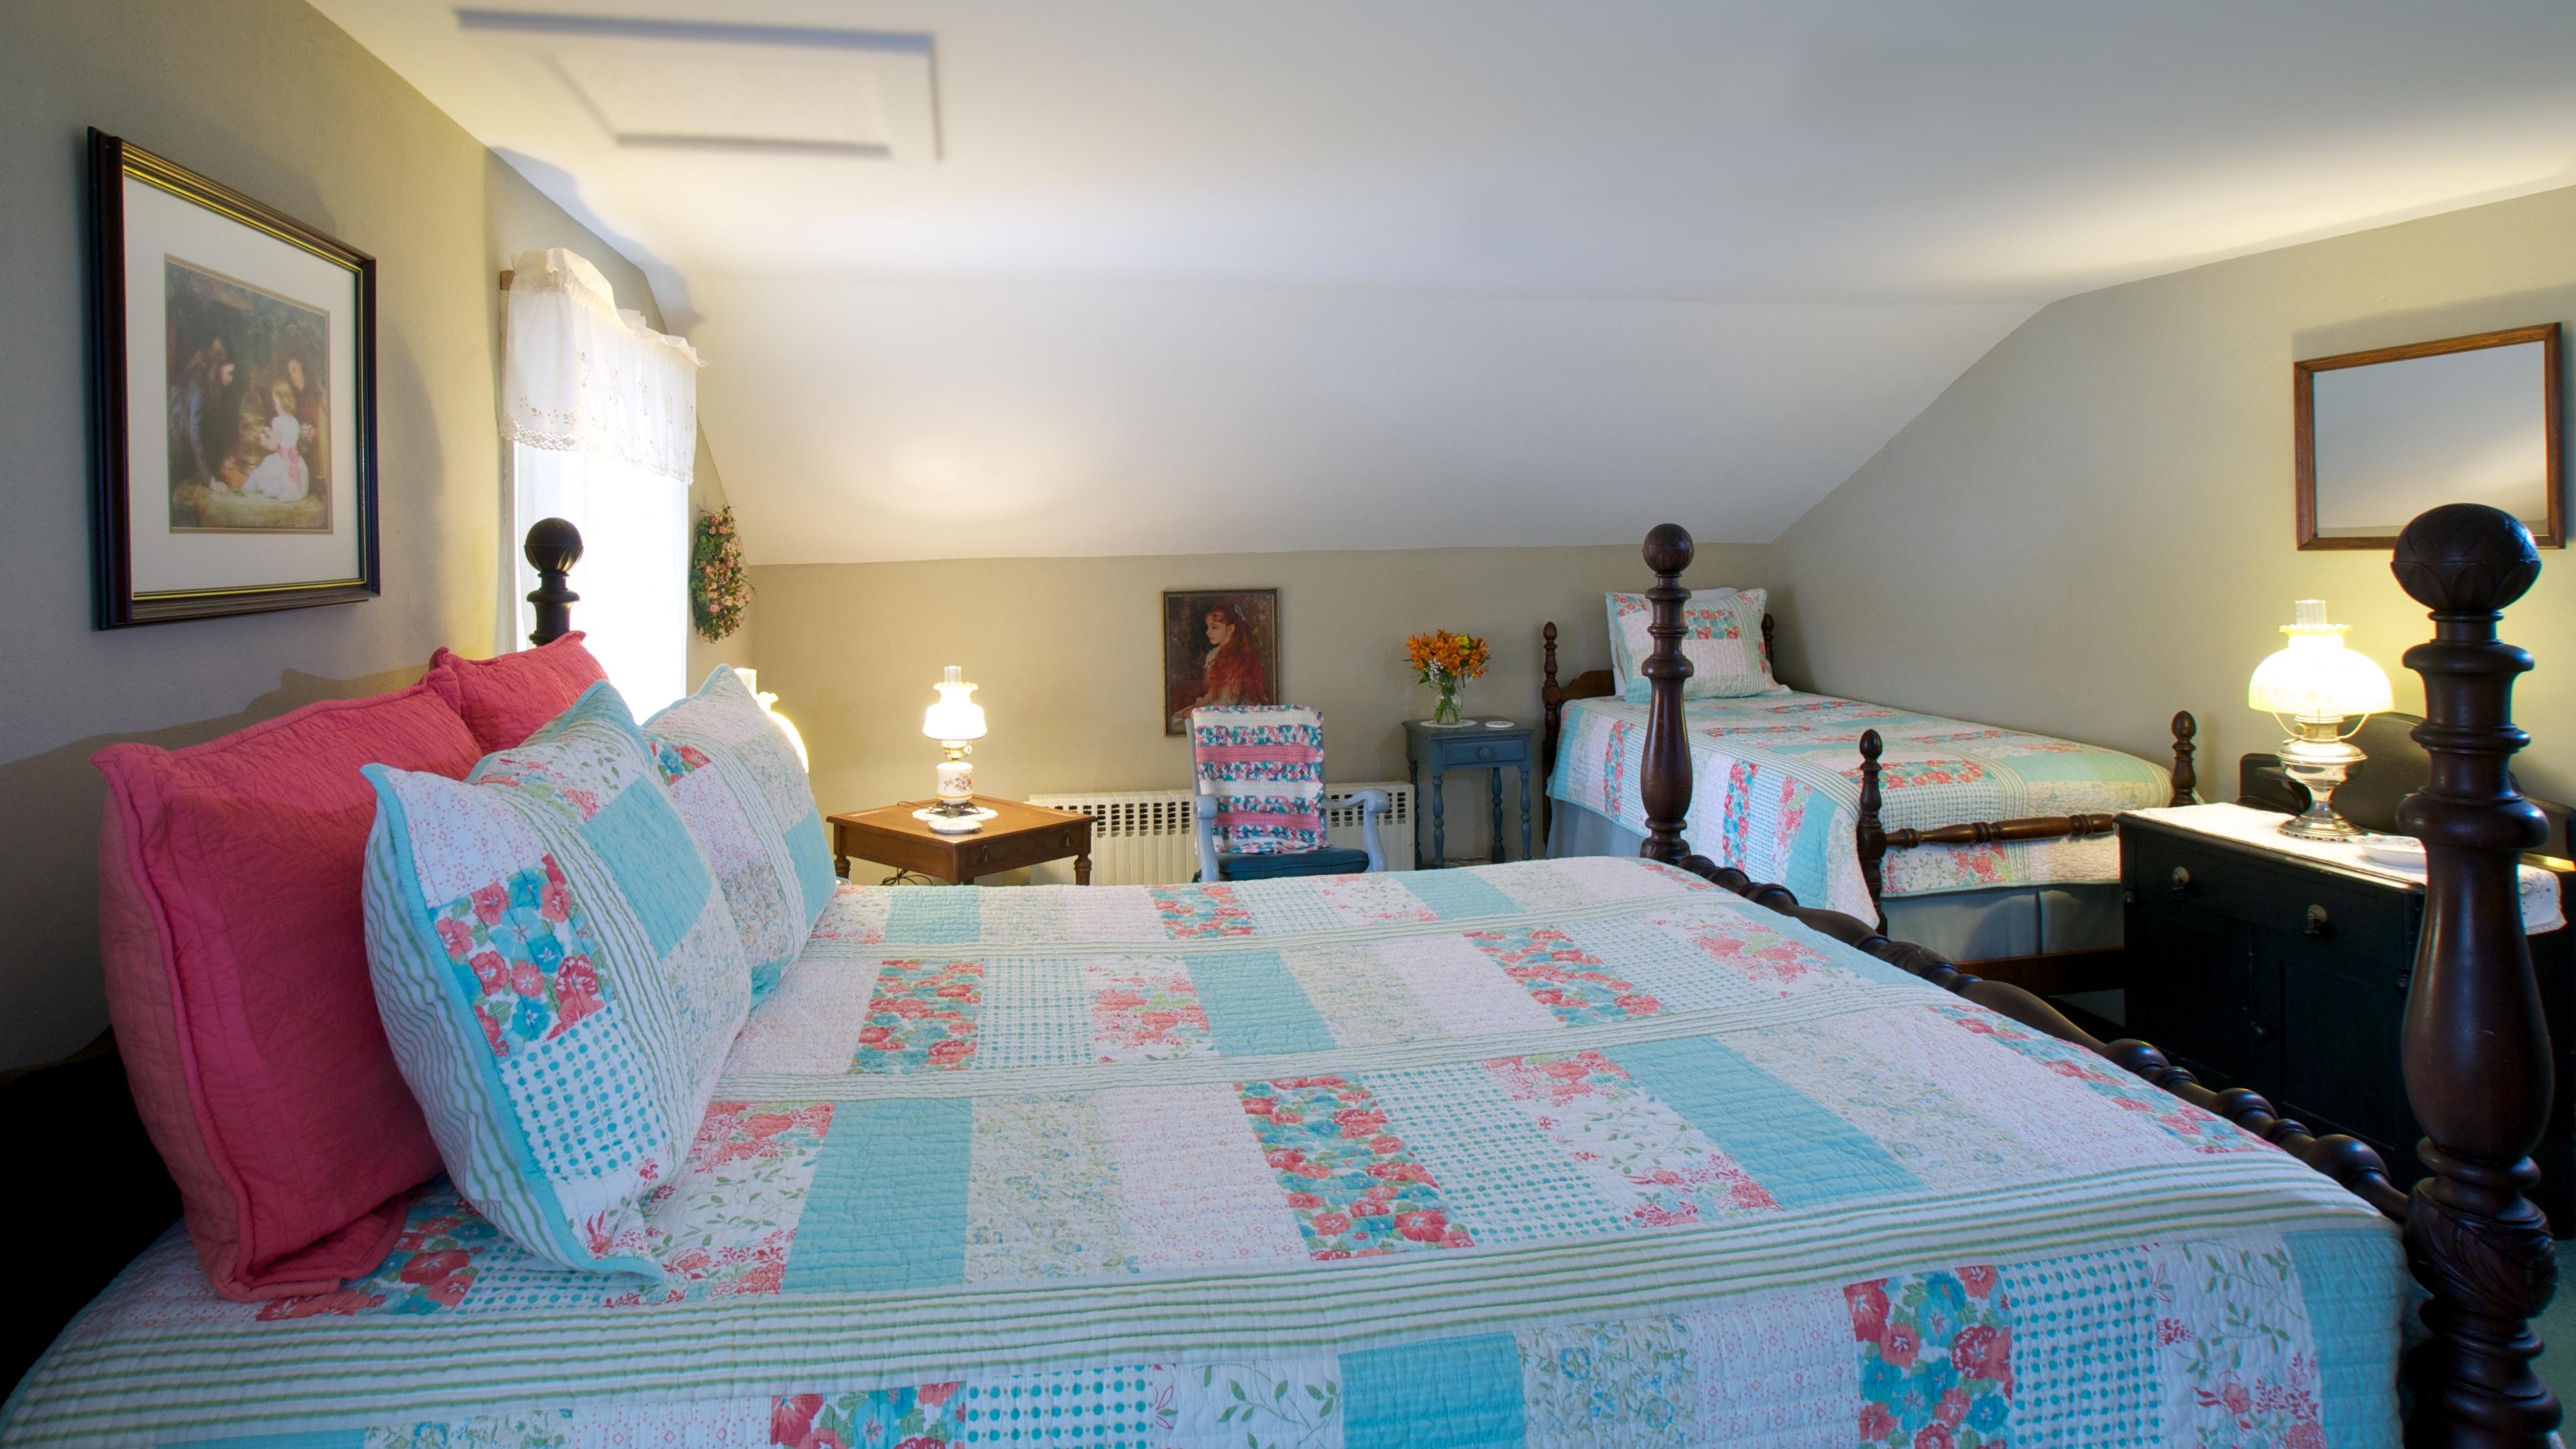 Maxwell Creek Inn Bed & Breakfast, Sodus NY